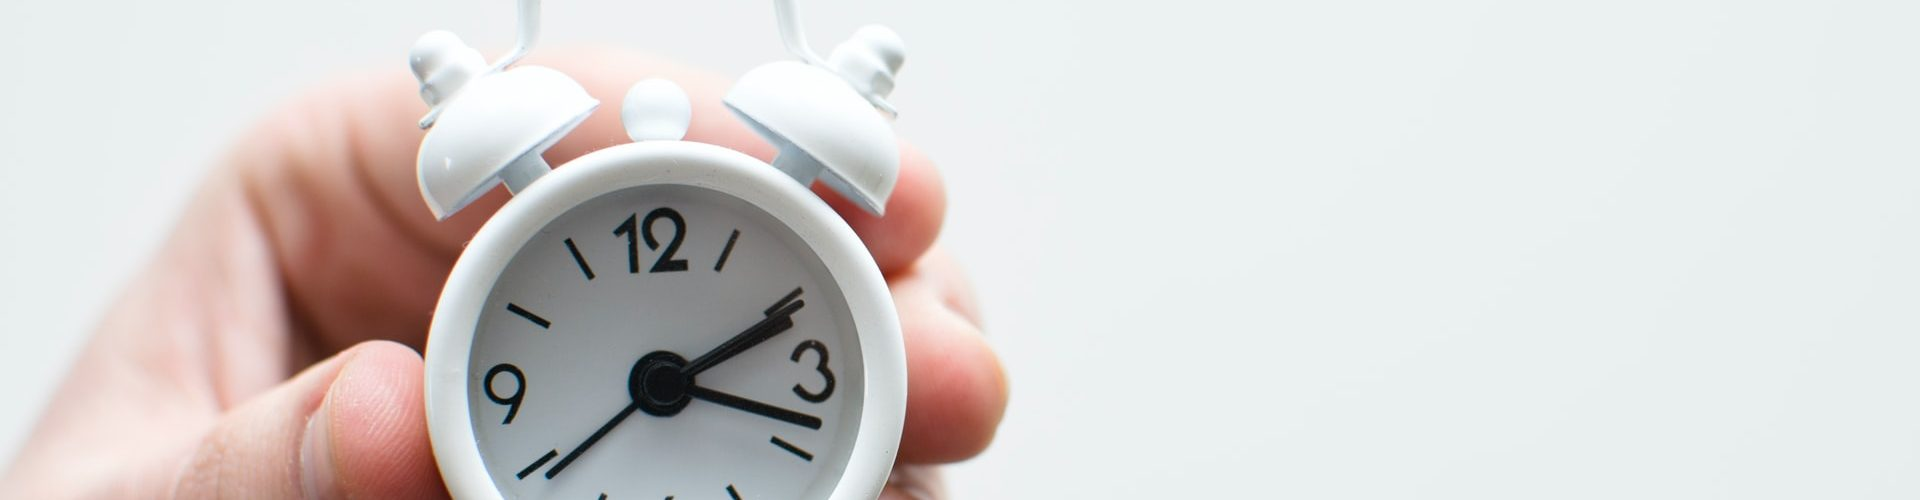 Ako želiš, imaš vremena…